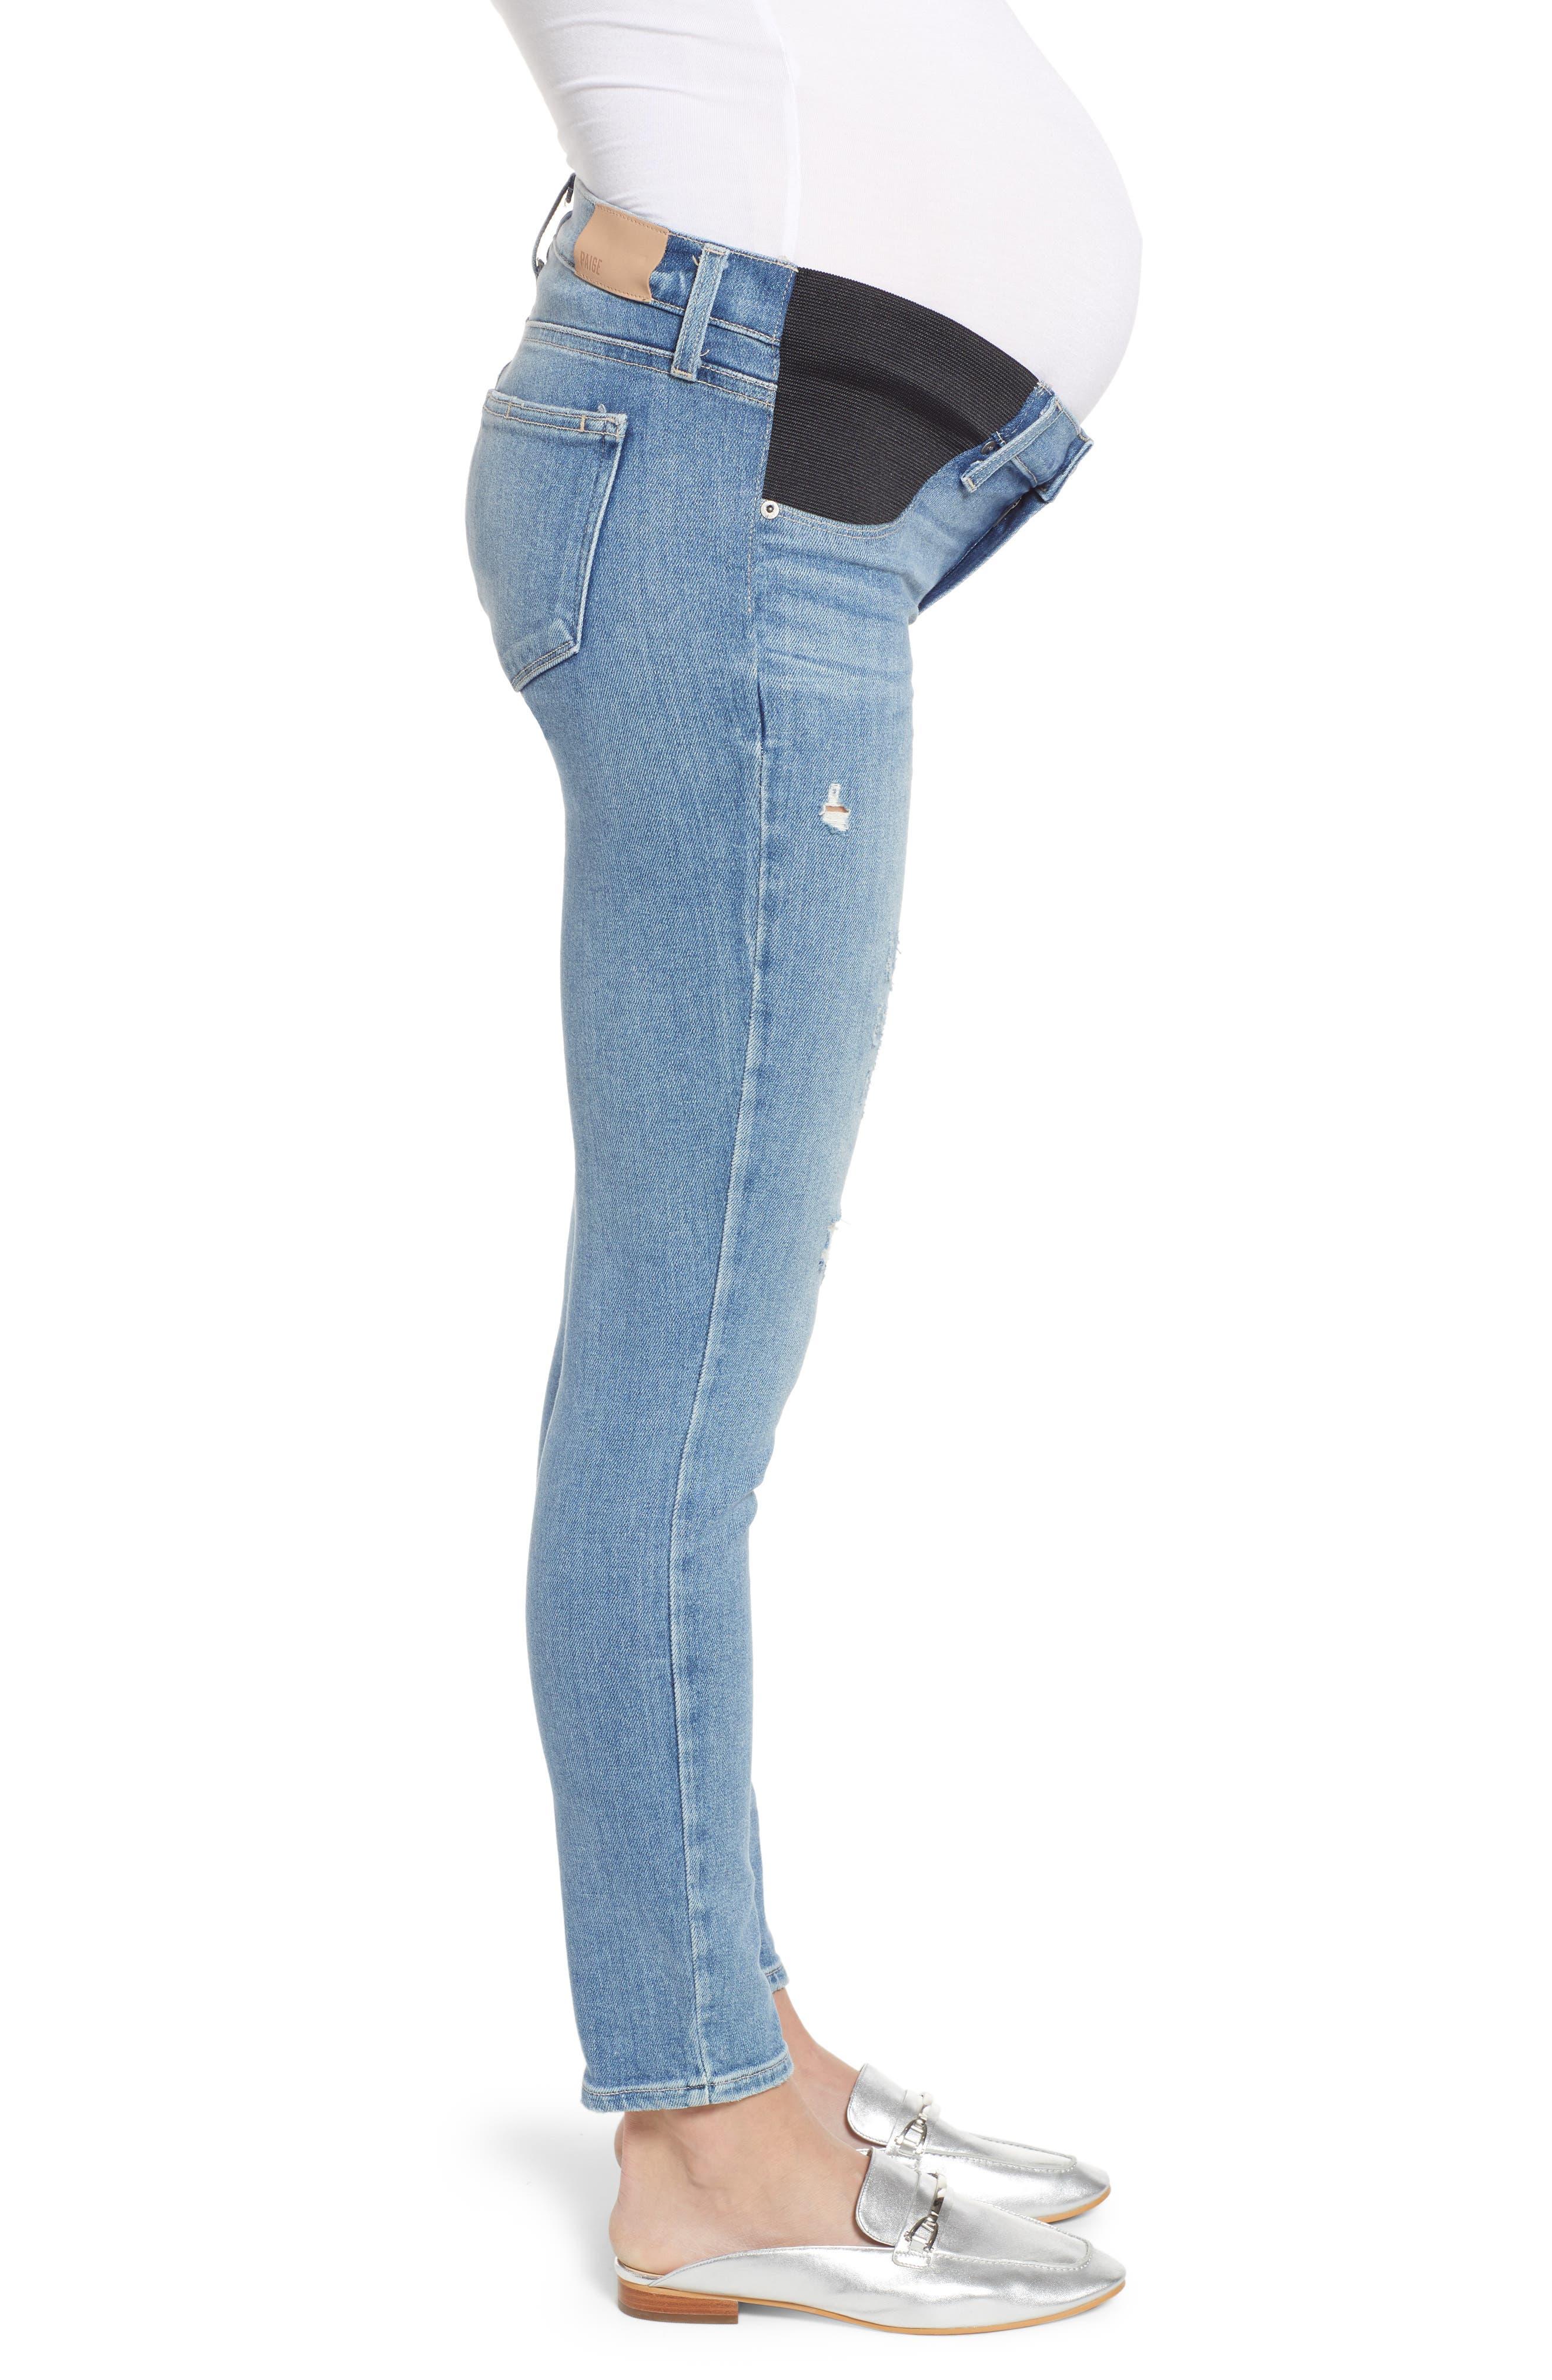 Verdugo Distressed Ankle Skinny Maternity Jeans,                             Alternate thumbnail 3, color,                             KAYSAN DISTRESSED